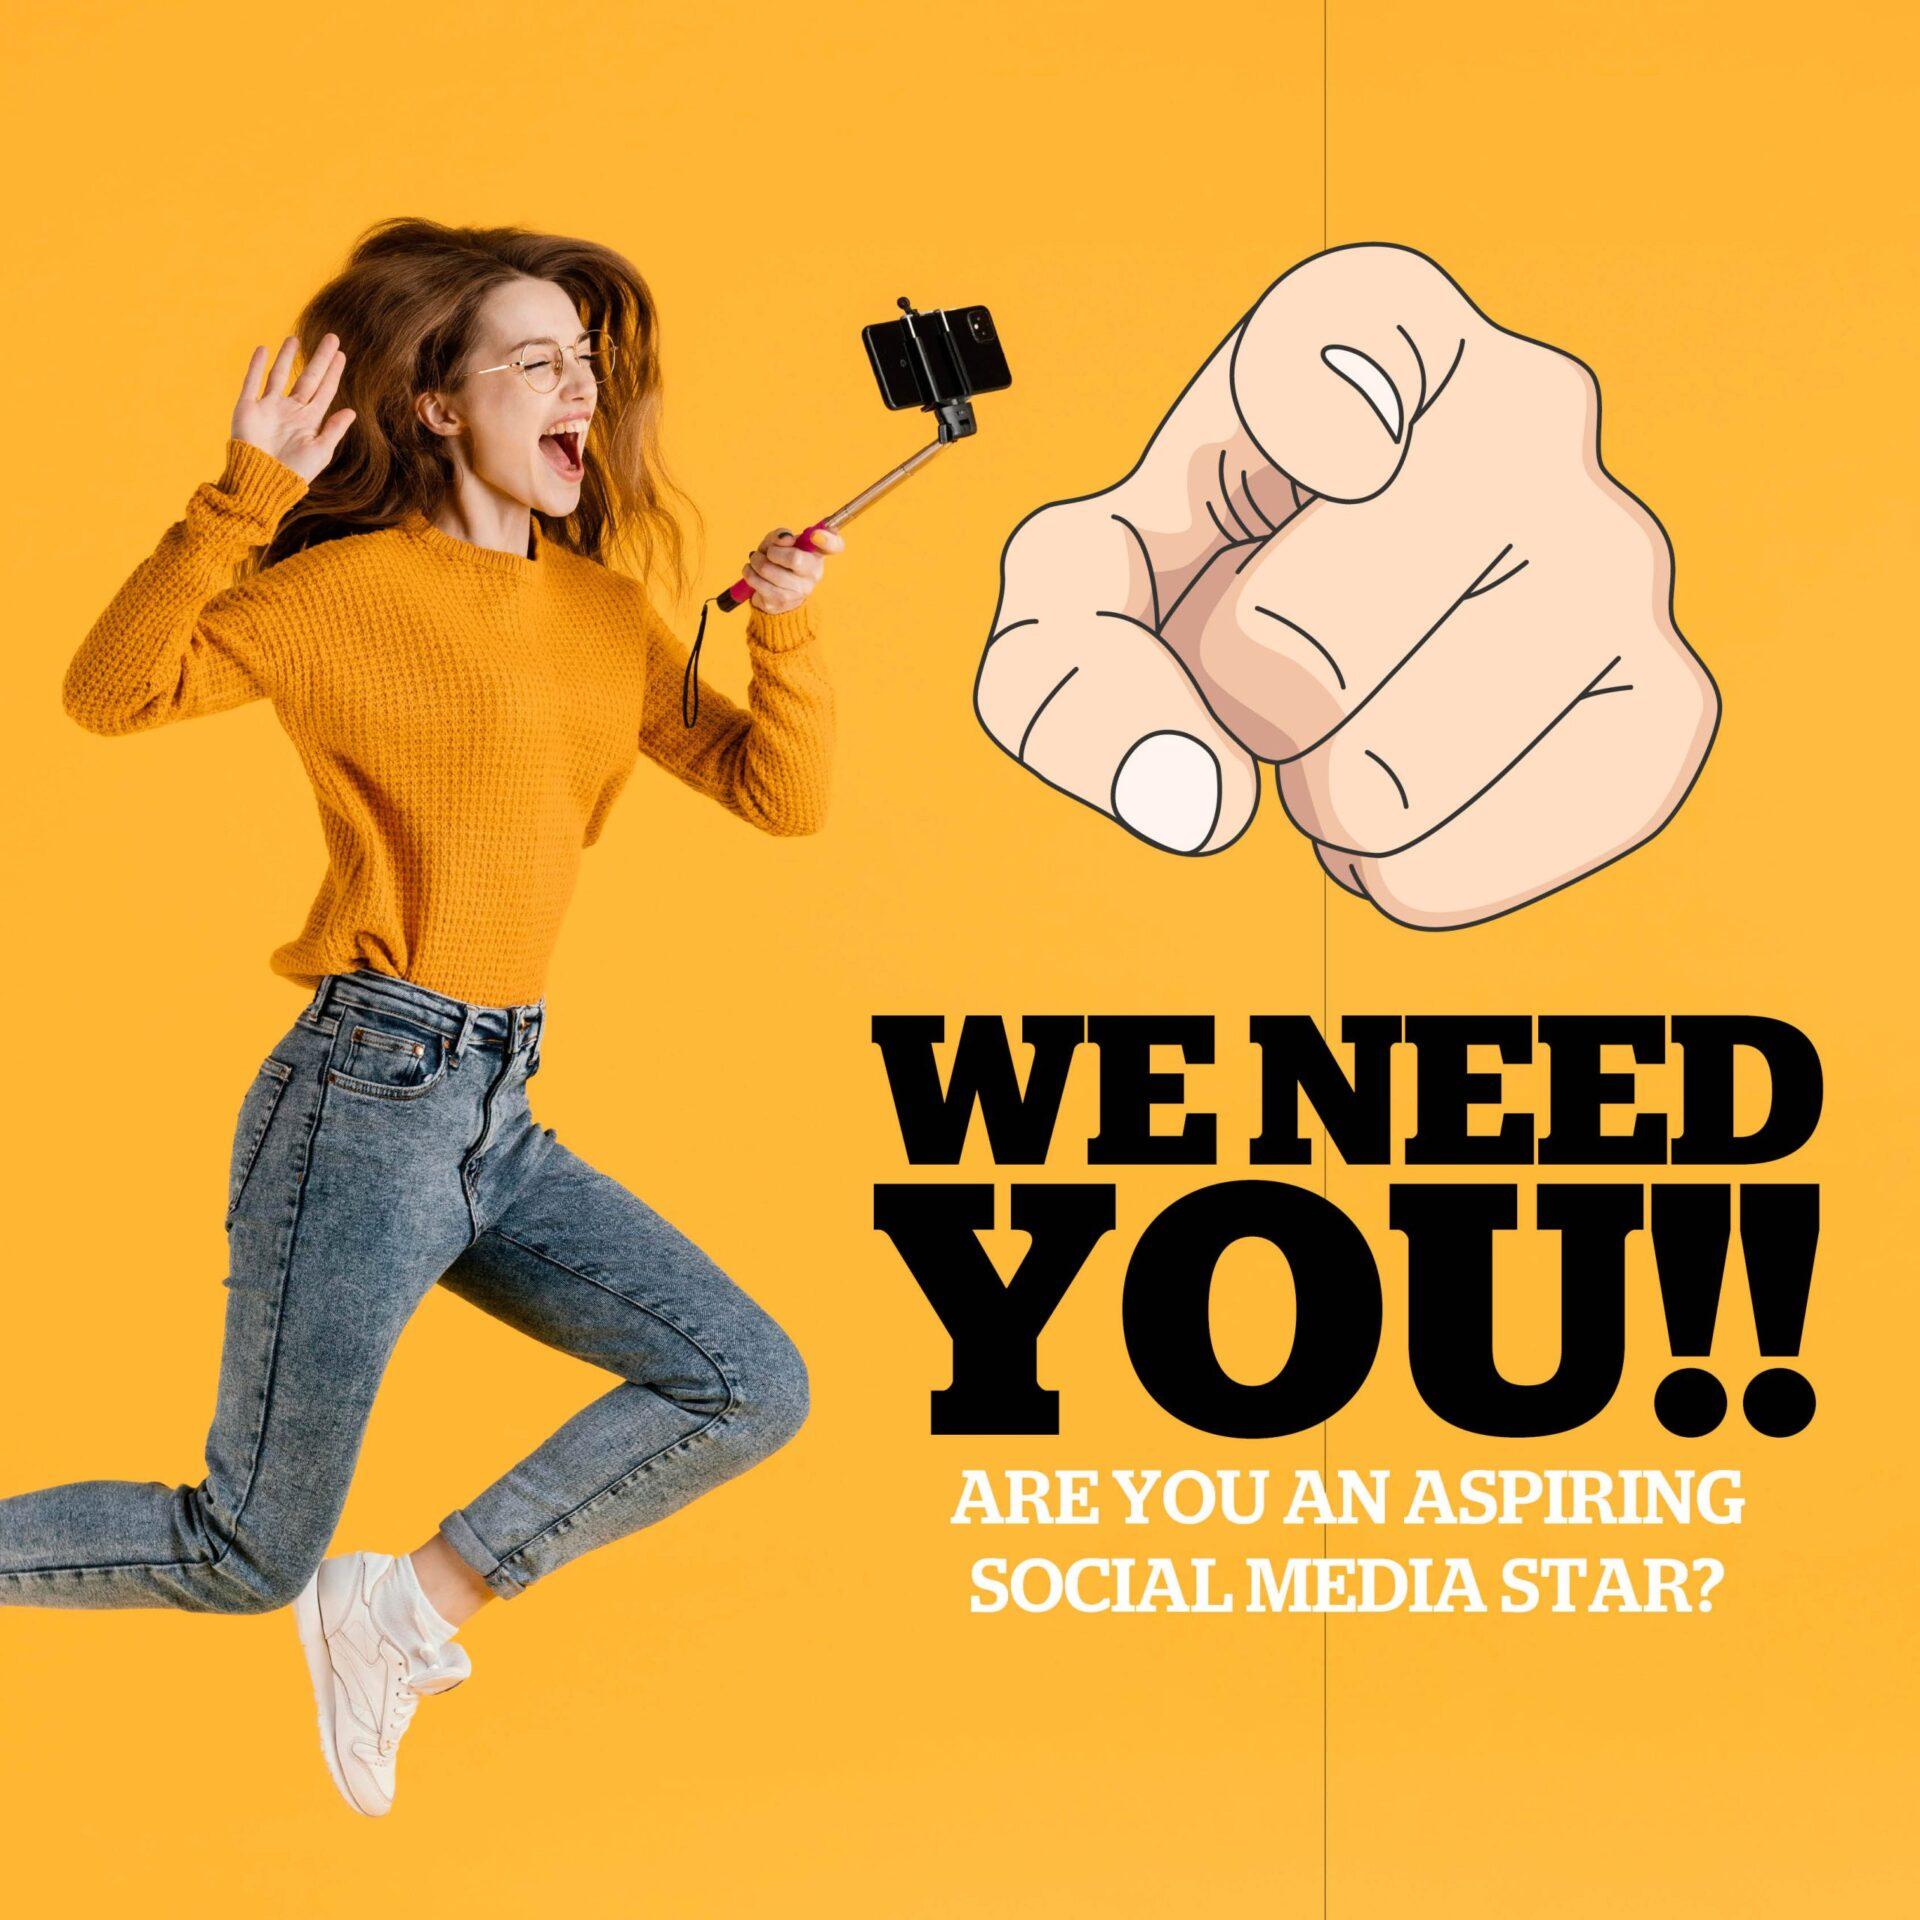 ARE YOU AN ASPIRING SOCIAL MEDIA STAR?